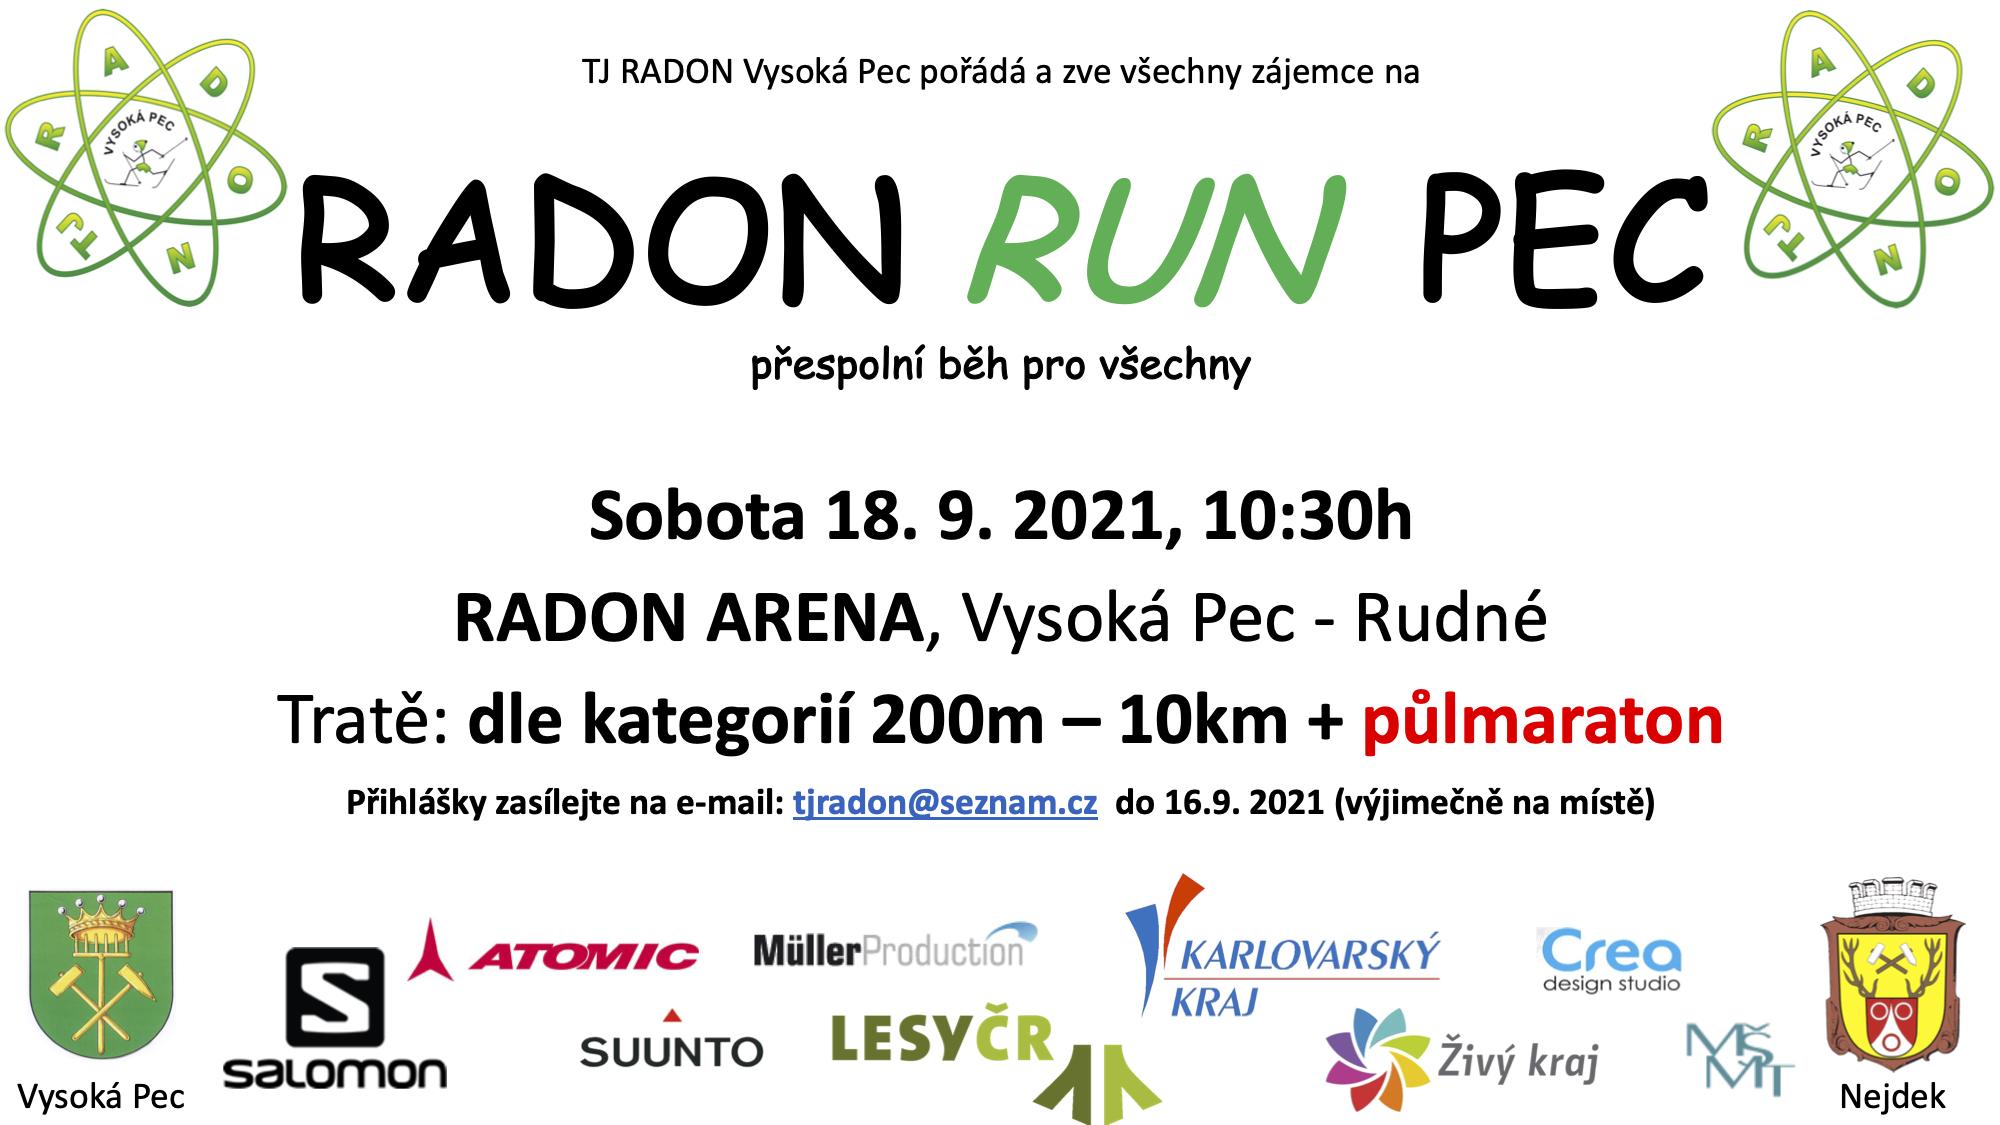 2021_radon_run_pec_TJRADON